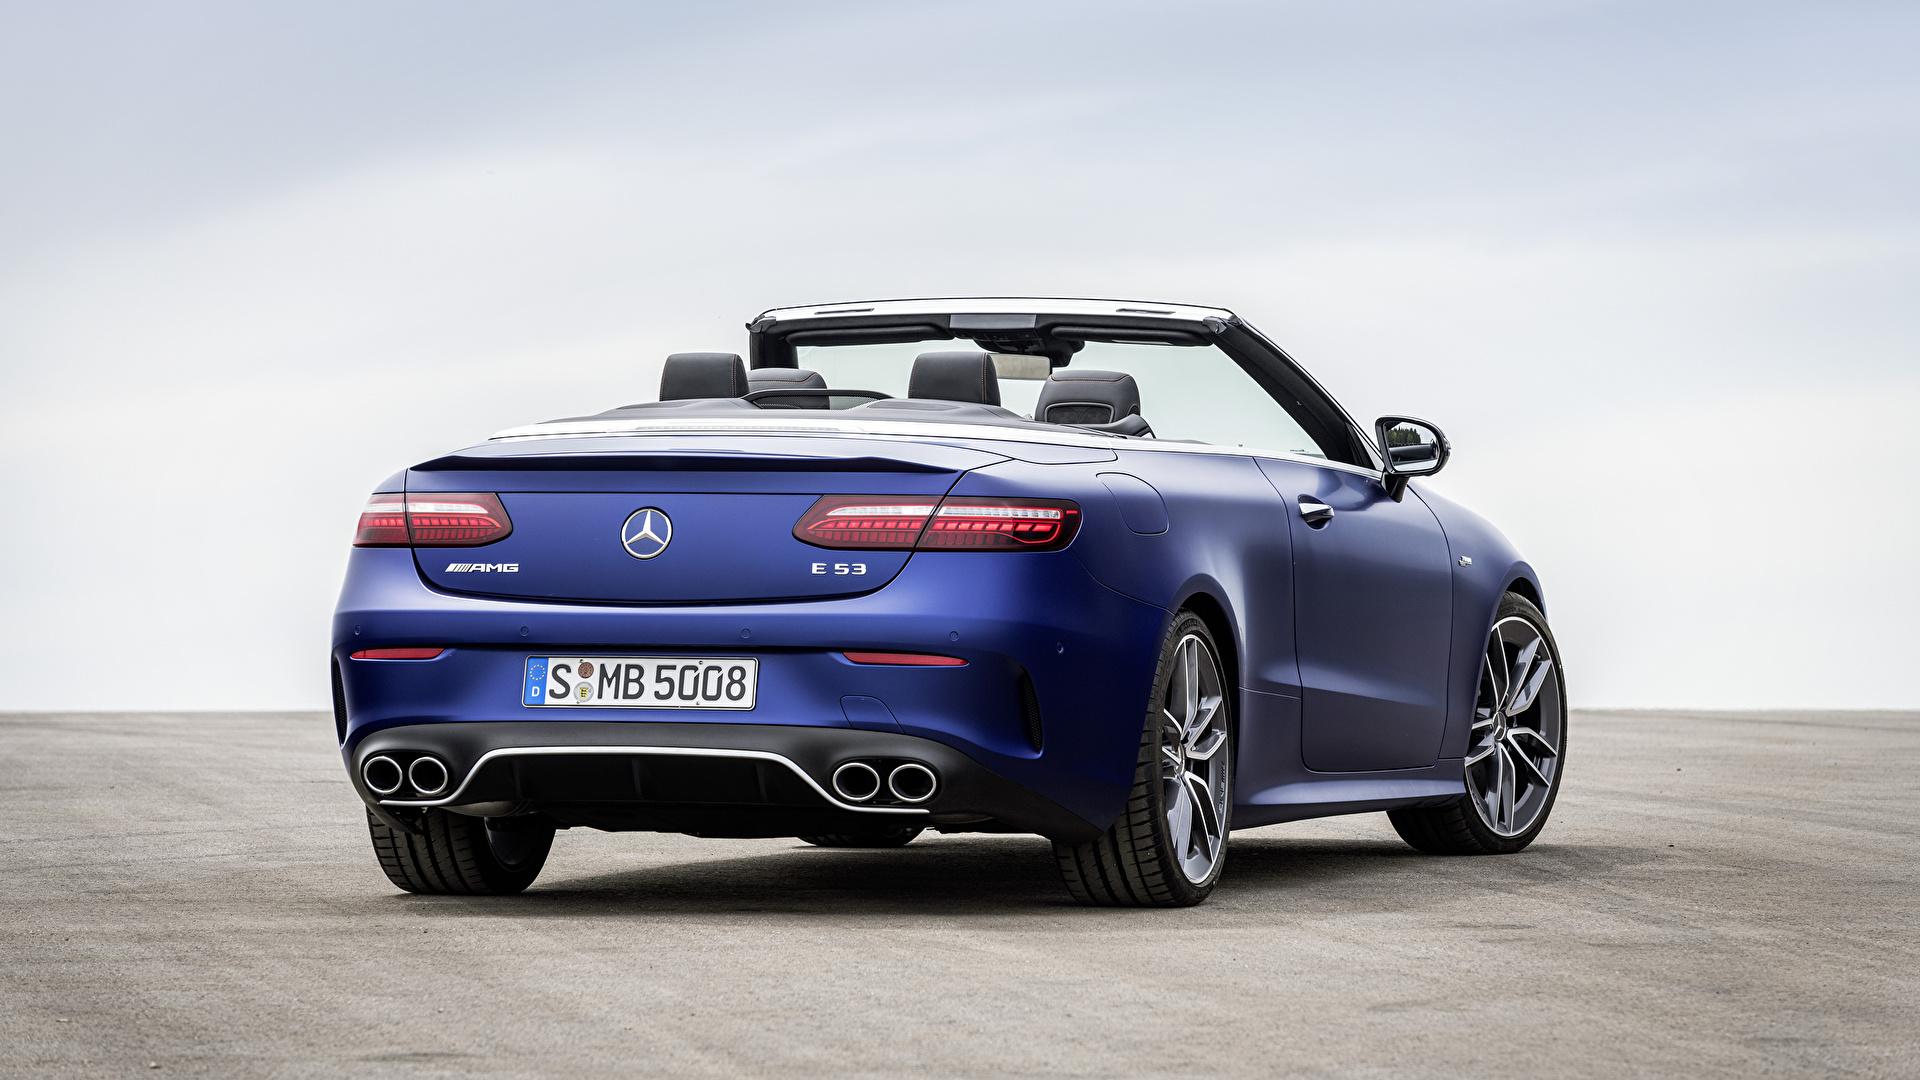 Fotos Mercedes-Benz E 53 4MATIC, Cabrio Worldwide, A238, 2020 Blau Autos Hinten Metallisch 1920x1080 Cabriolet auto automobil